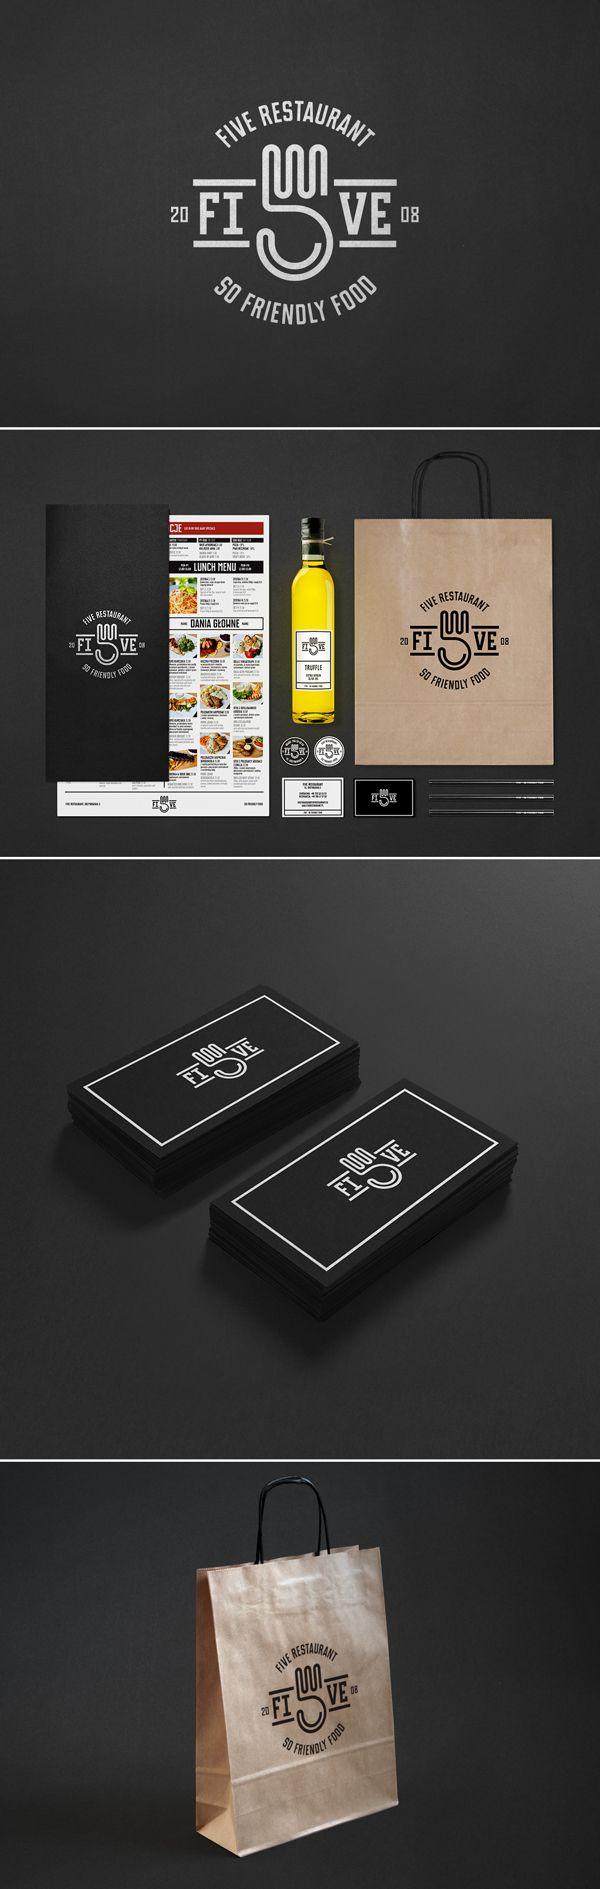 Five Restaurant. | #stationary #corporate #design #corporatedesign #identity #branding #marketing < repinned by www.BlickeDeeler.de | Visit our website: www.blickedeeler.de/leistungen/corporate-design